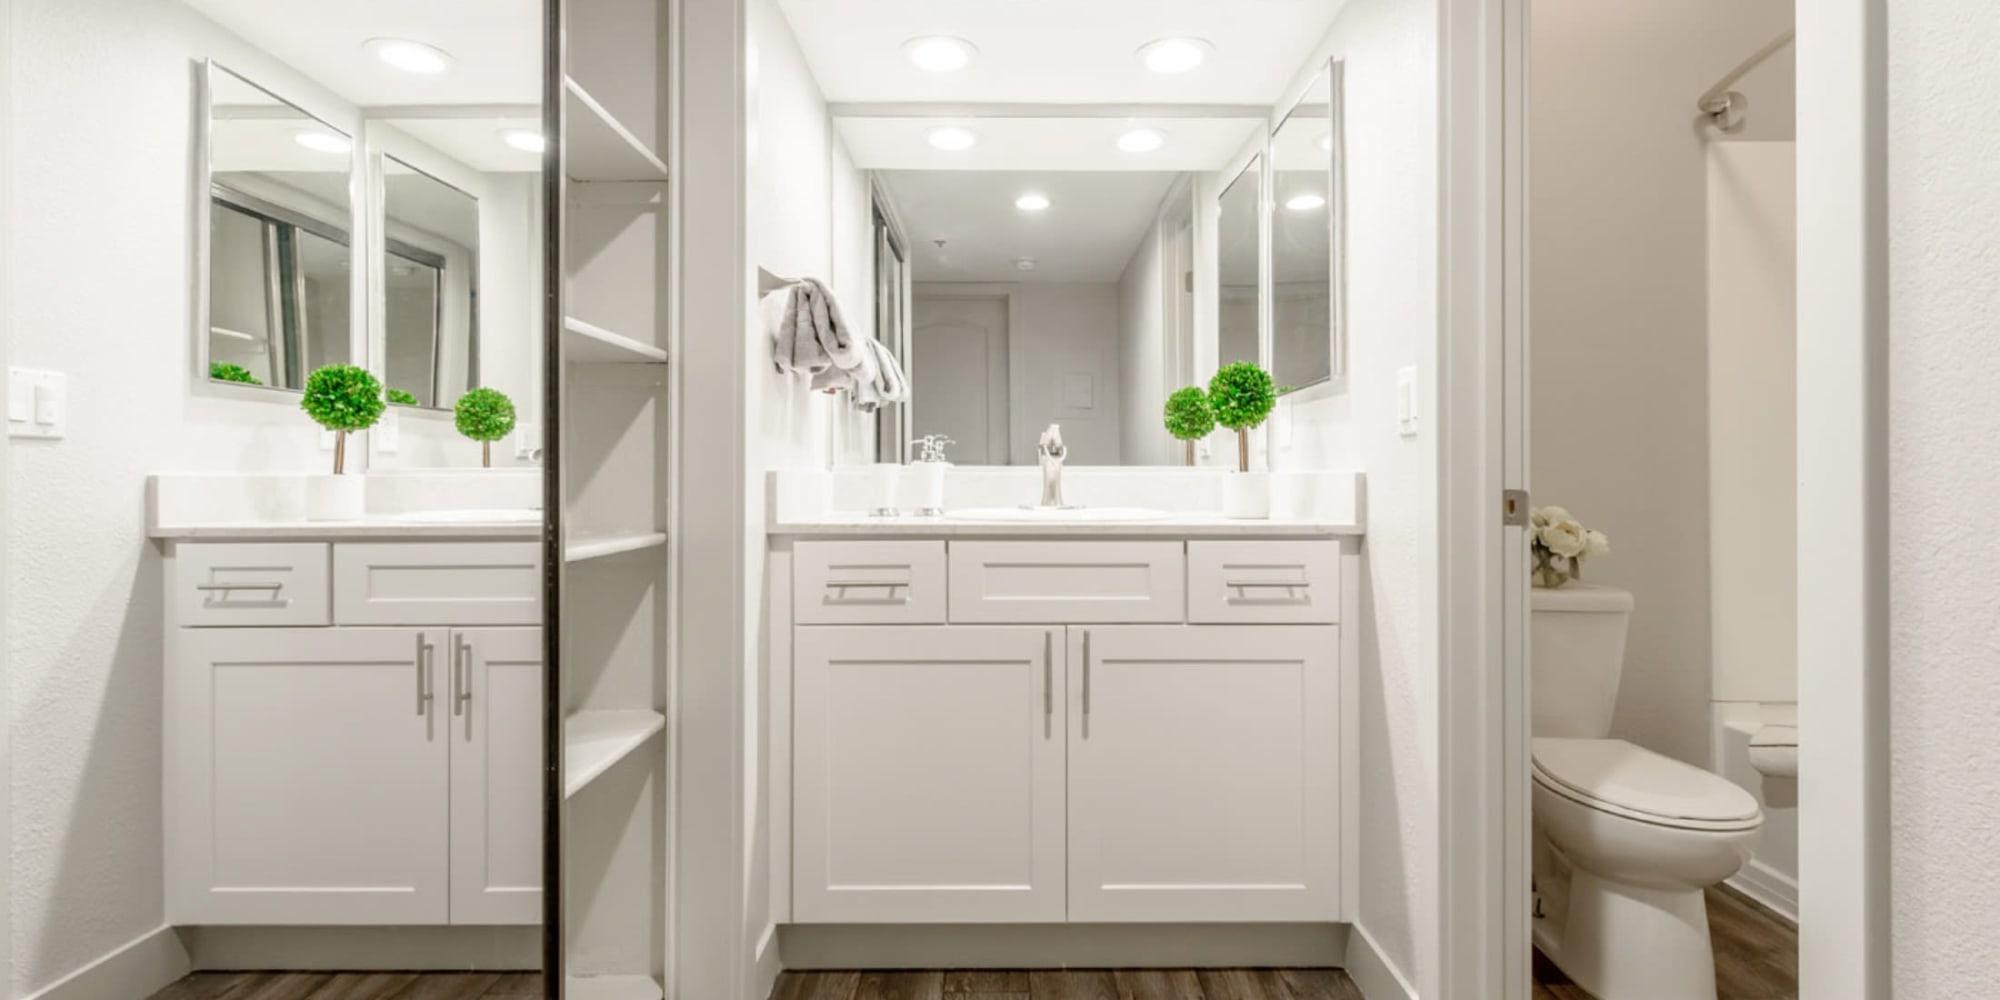 Recently remodeled model home's bathroom with a quartz countertop at Sendero Huntington Beach in Huntington Beach, California